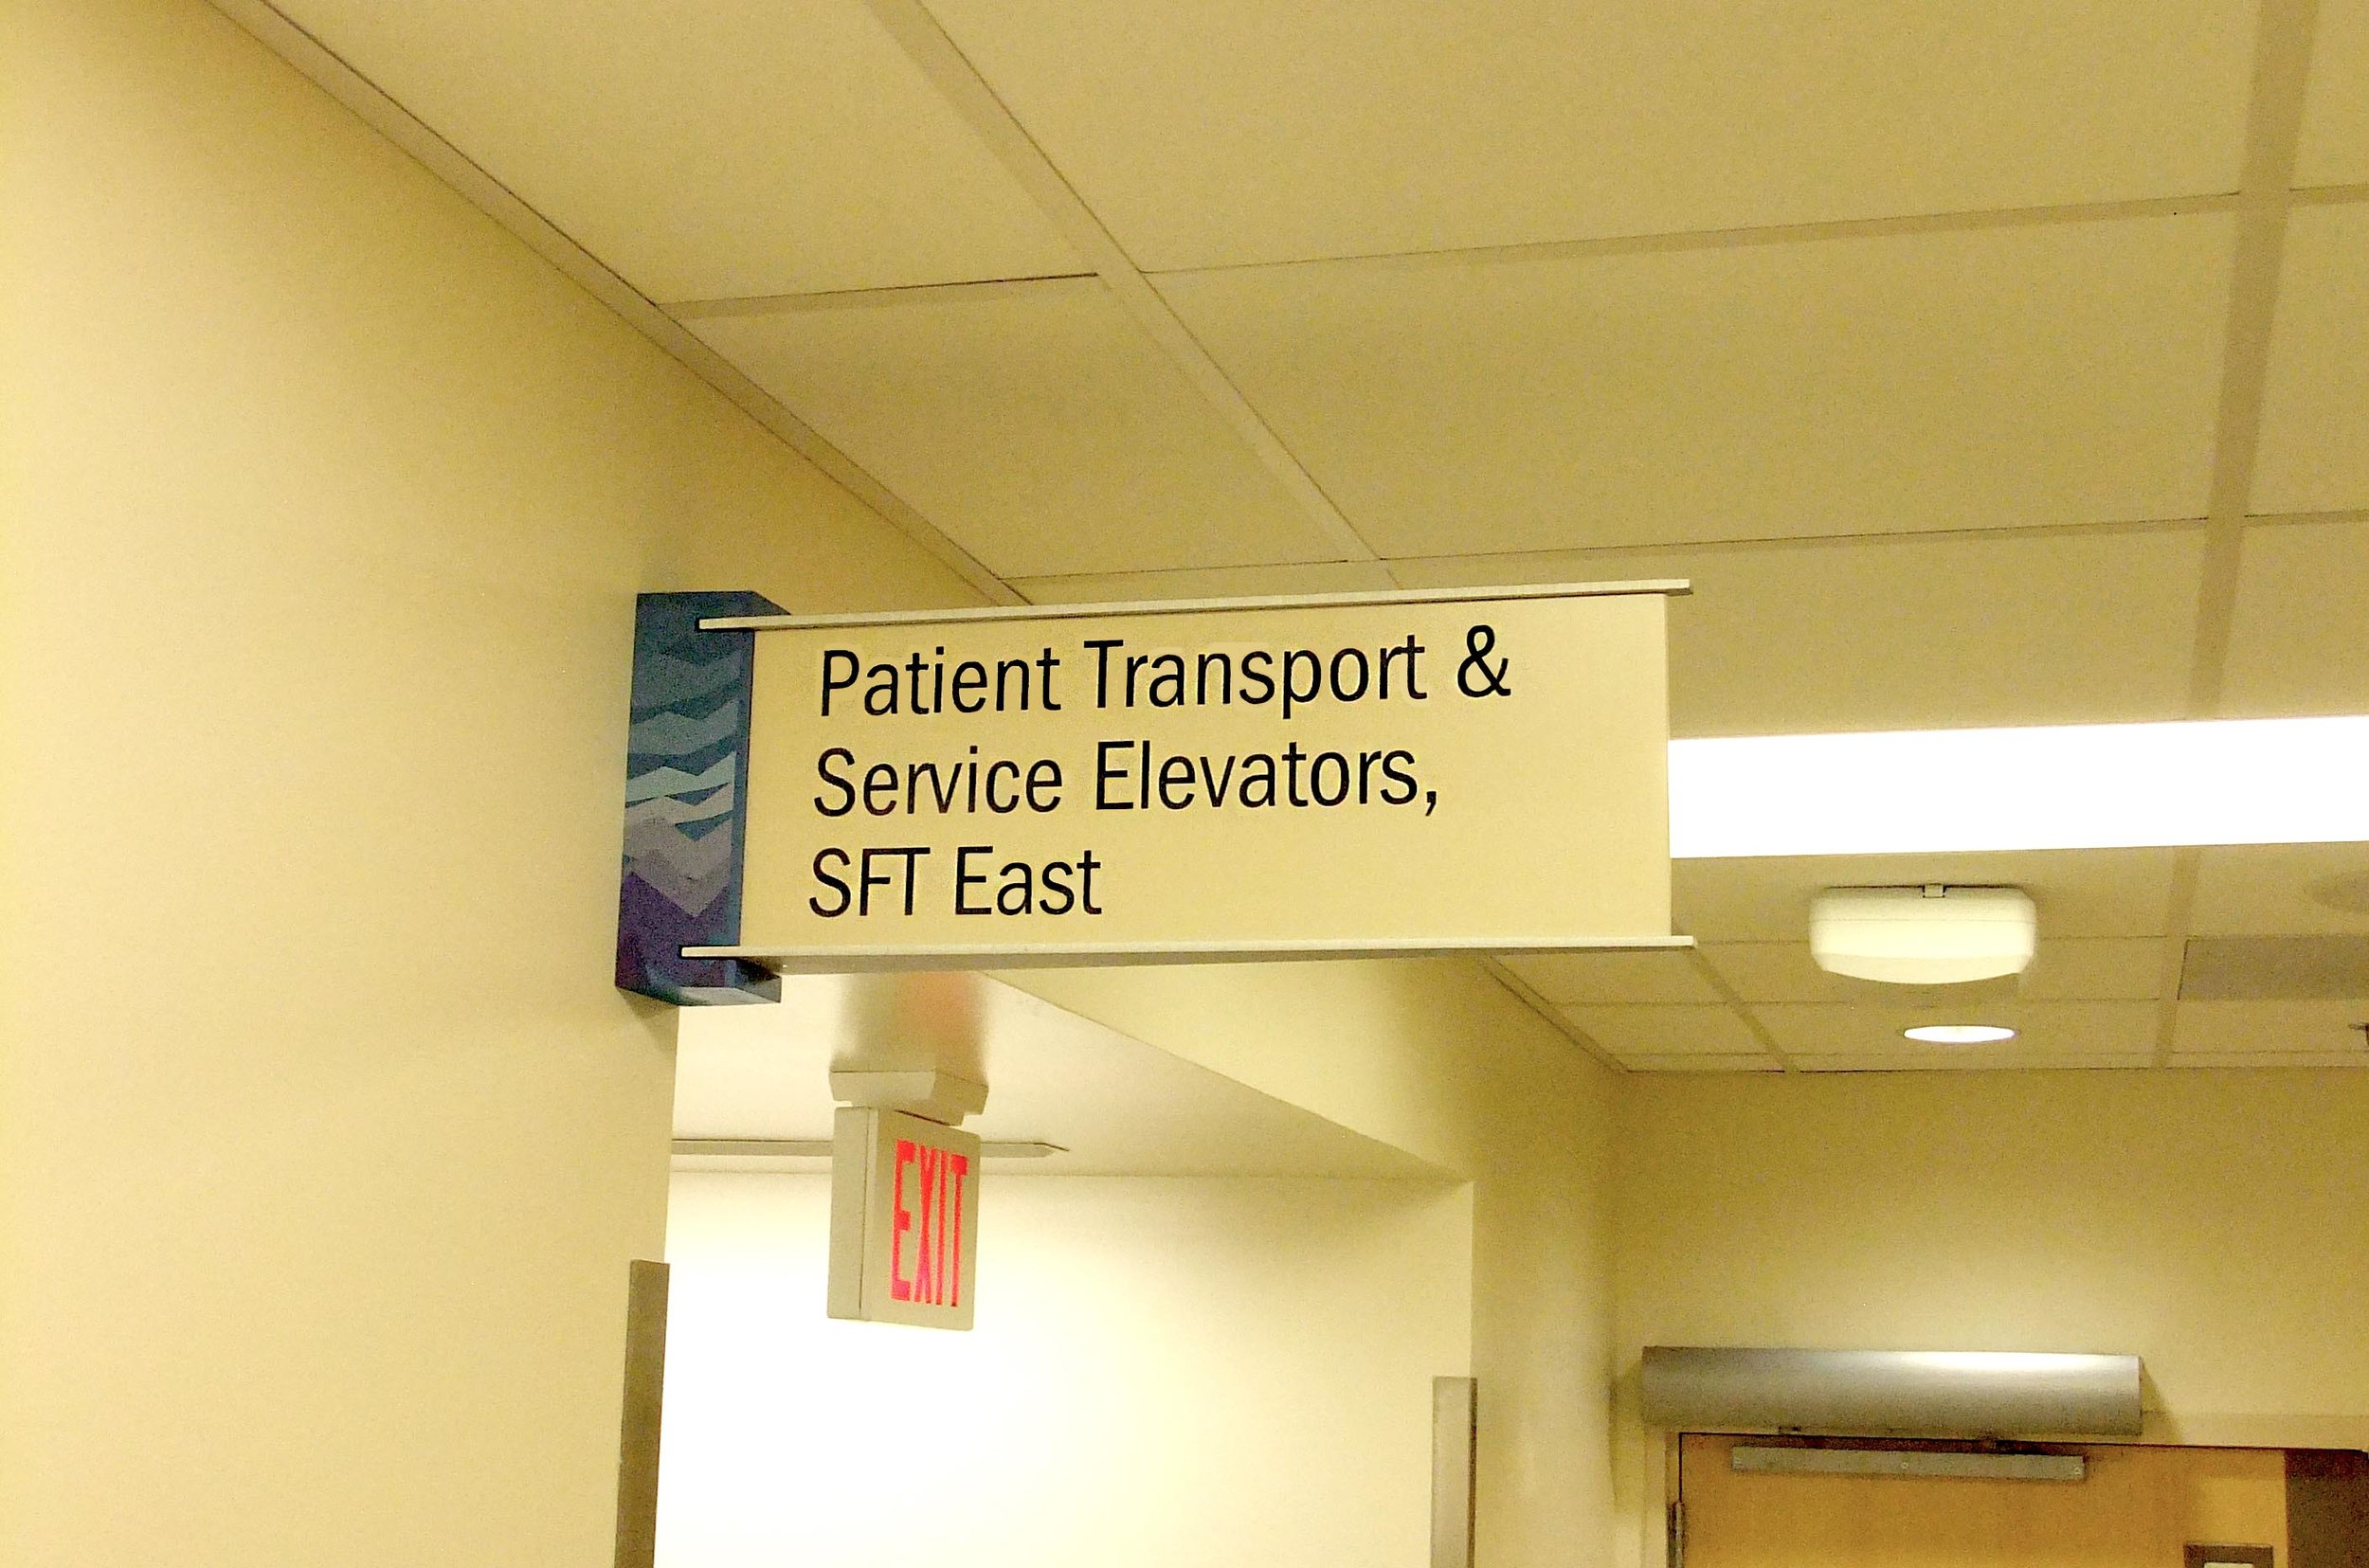 hostpial wayfinding sign on wall.jpg